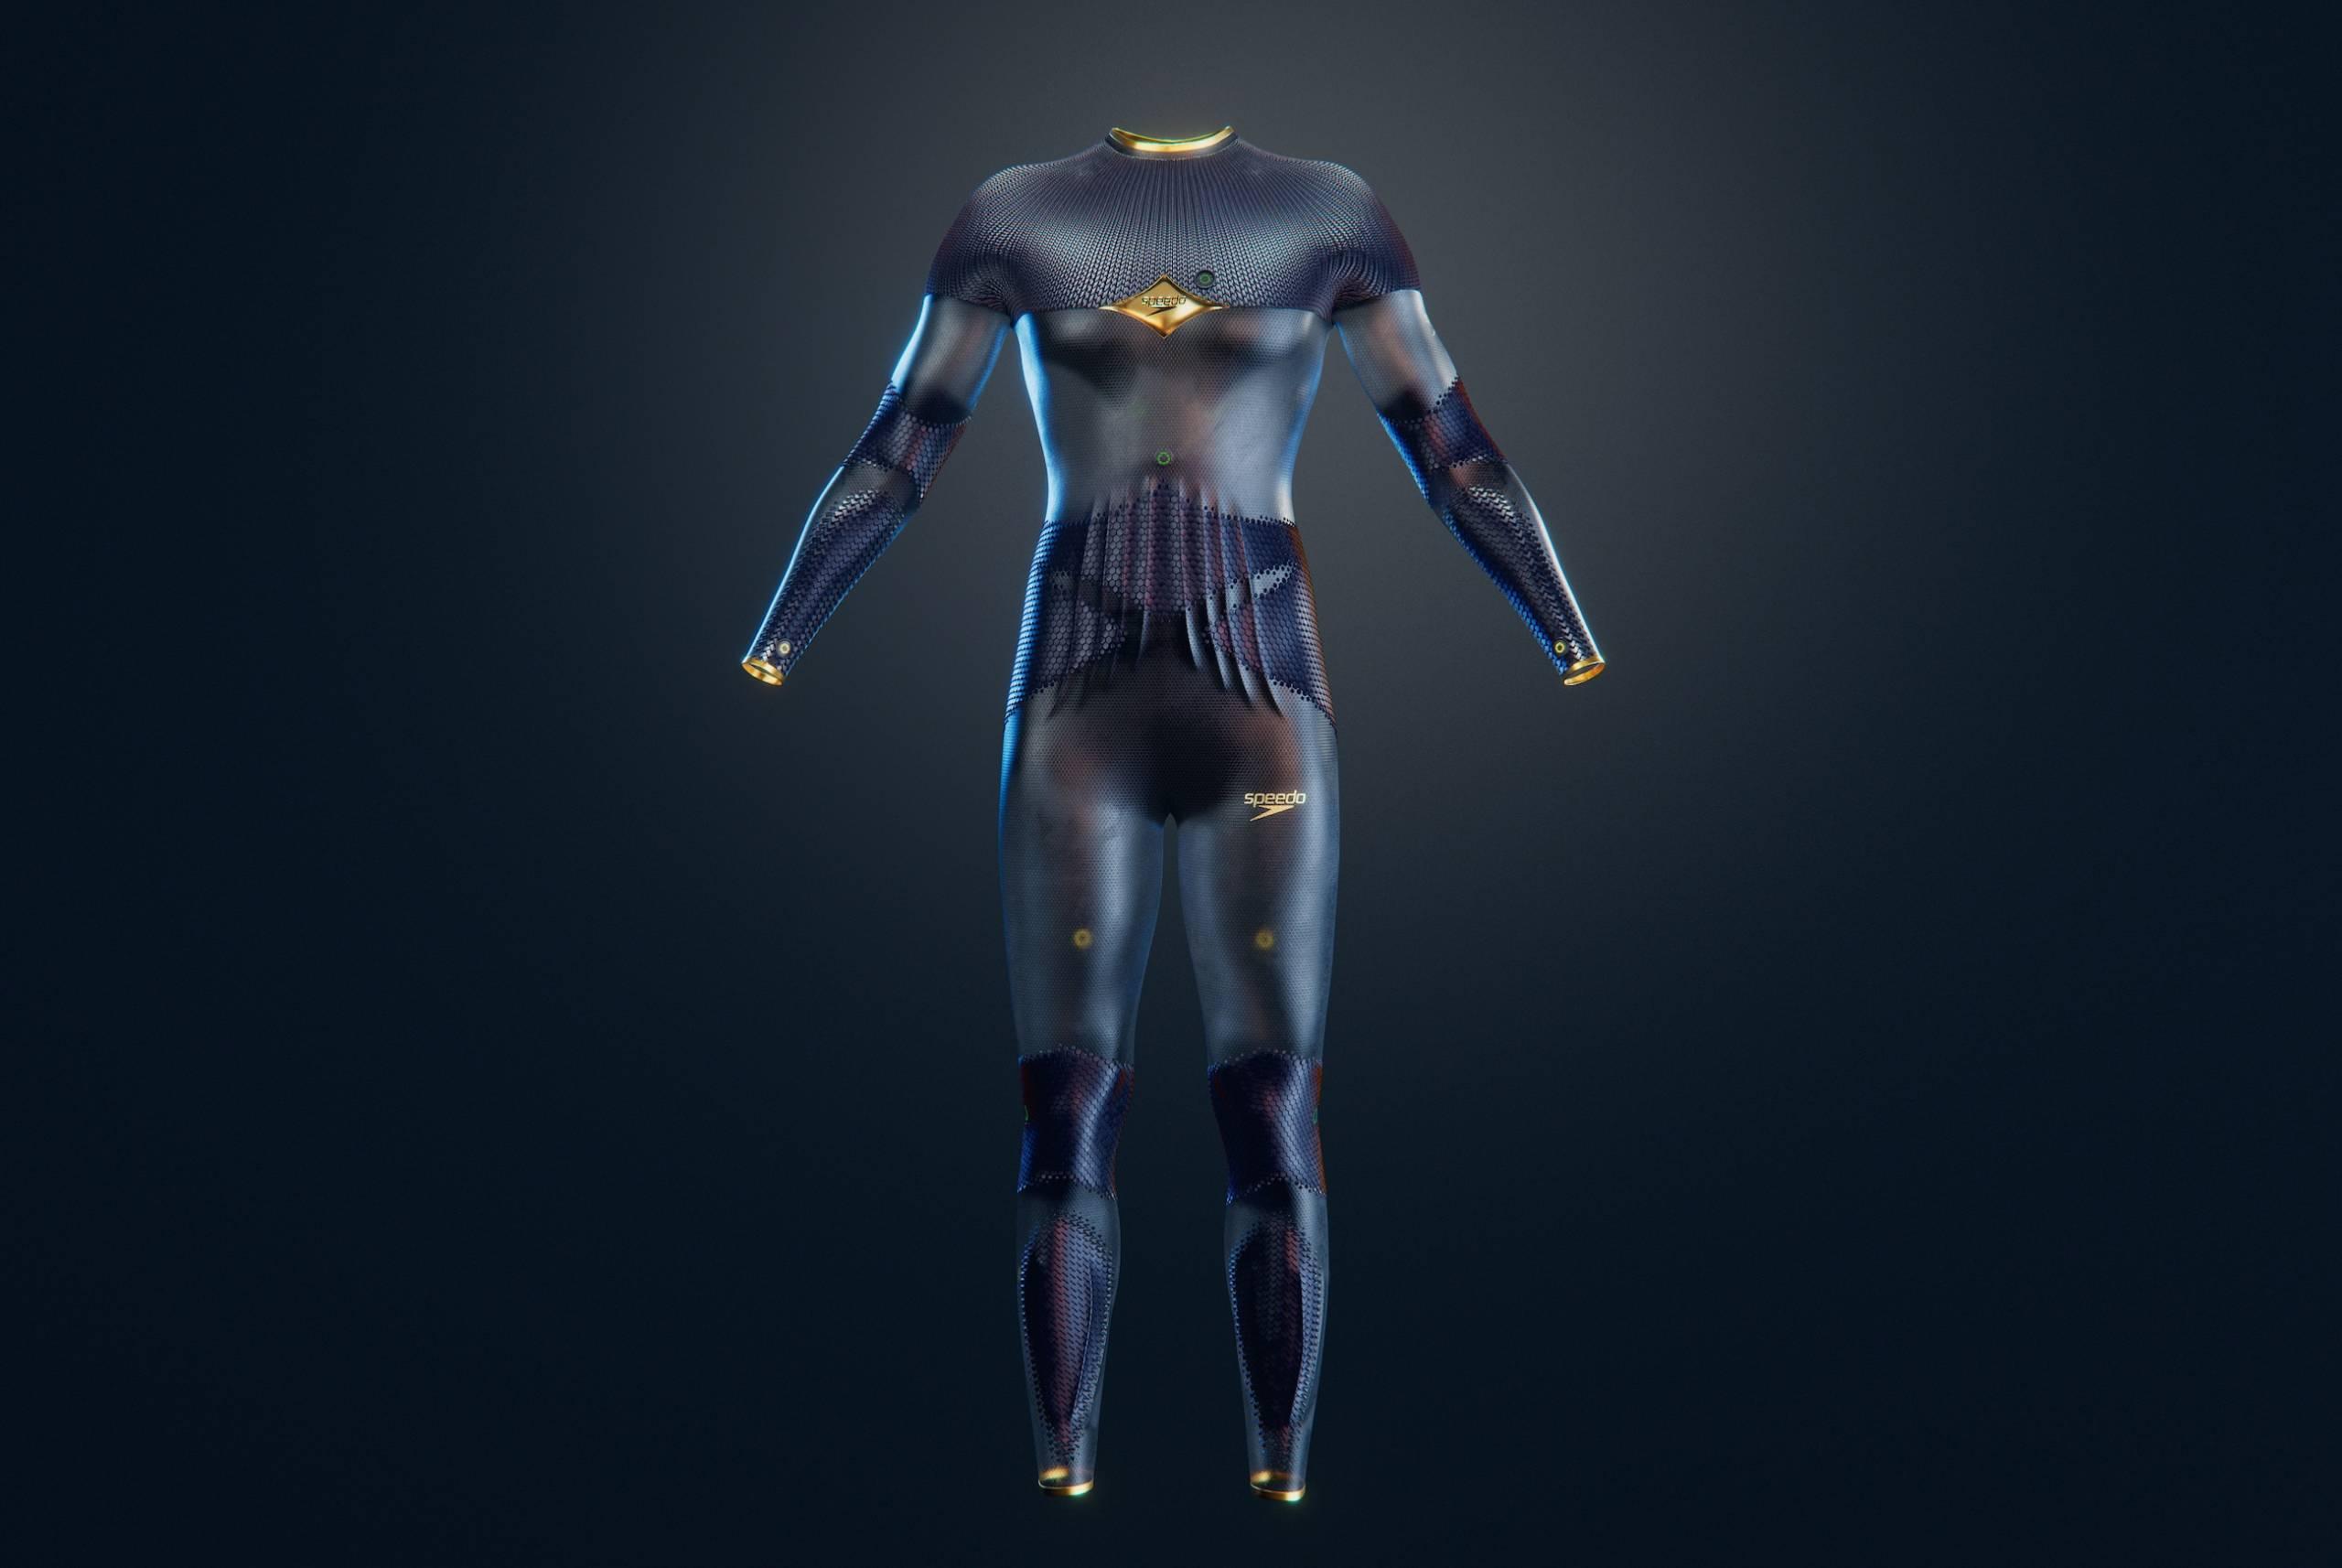 Full body Speedo swimsuit with AI sensors